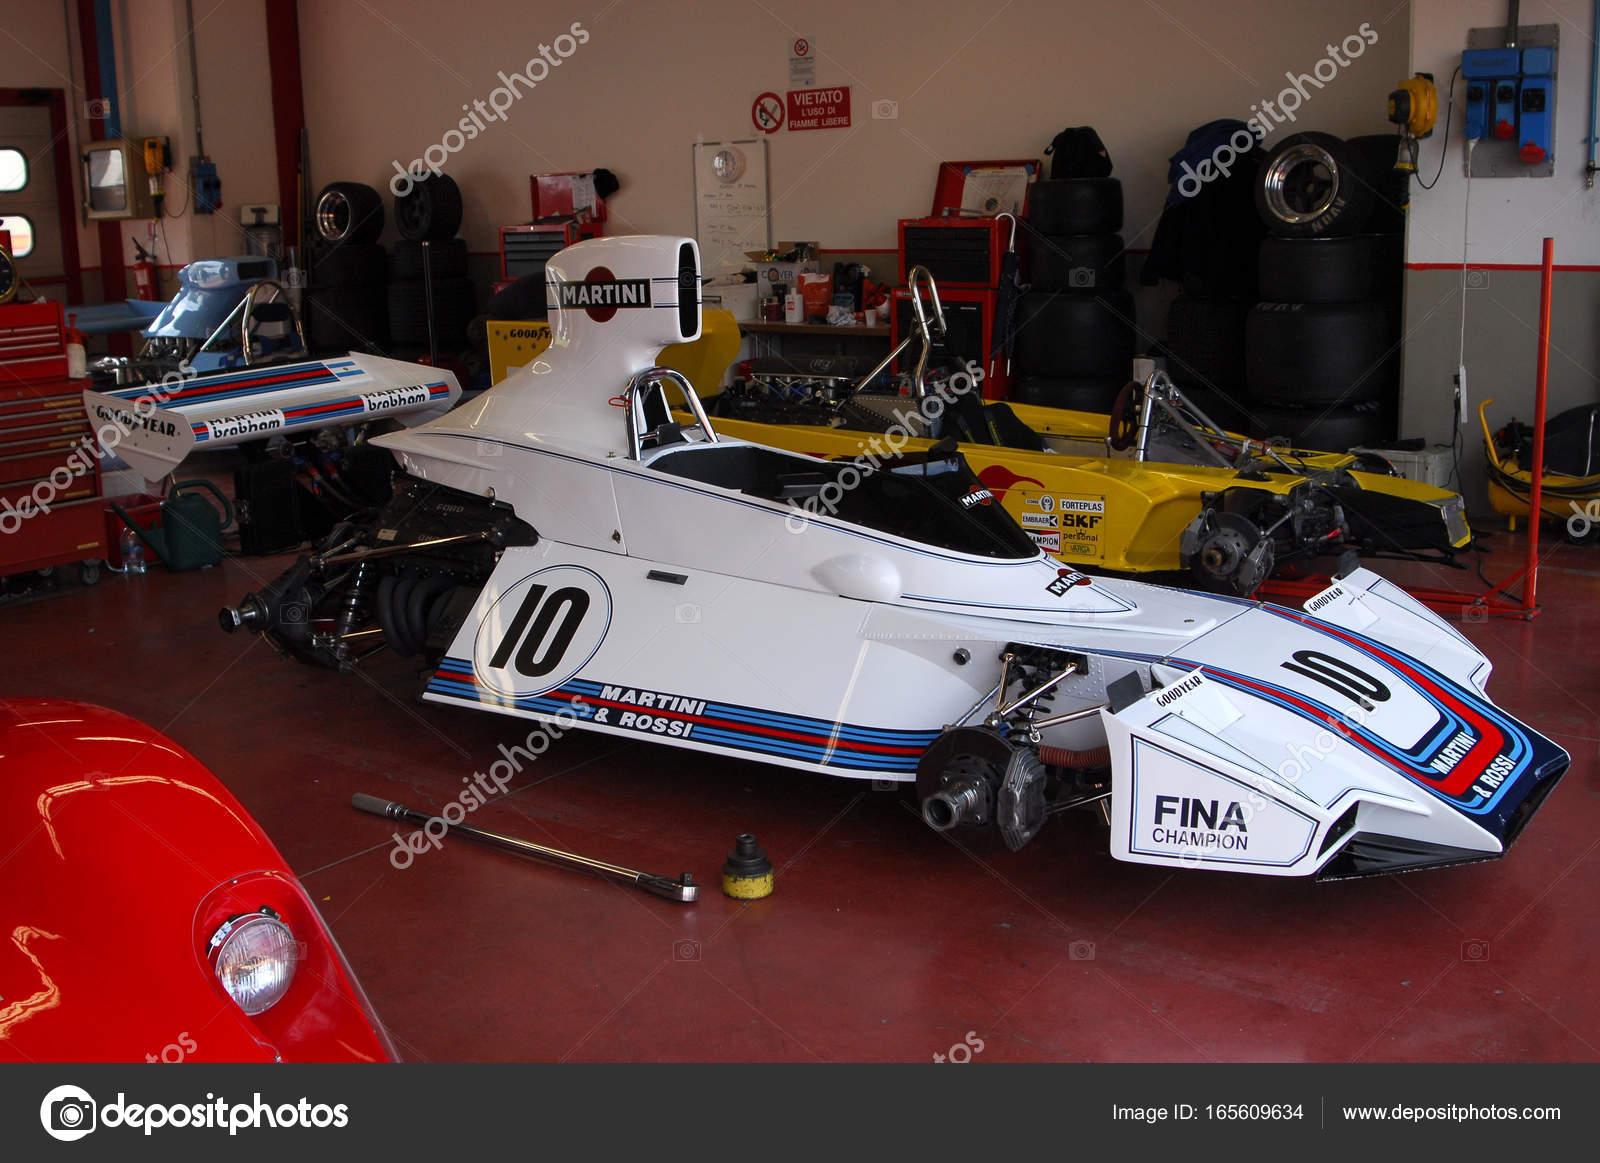 Mugello Circuit 1 April 2007: Classic F1 Car 1975 Brabham BT44B ex ...